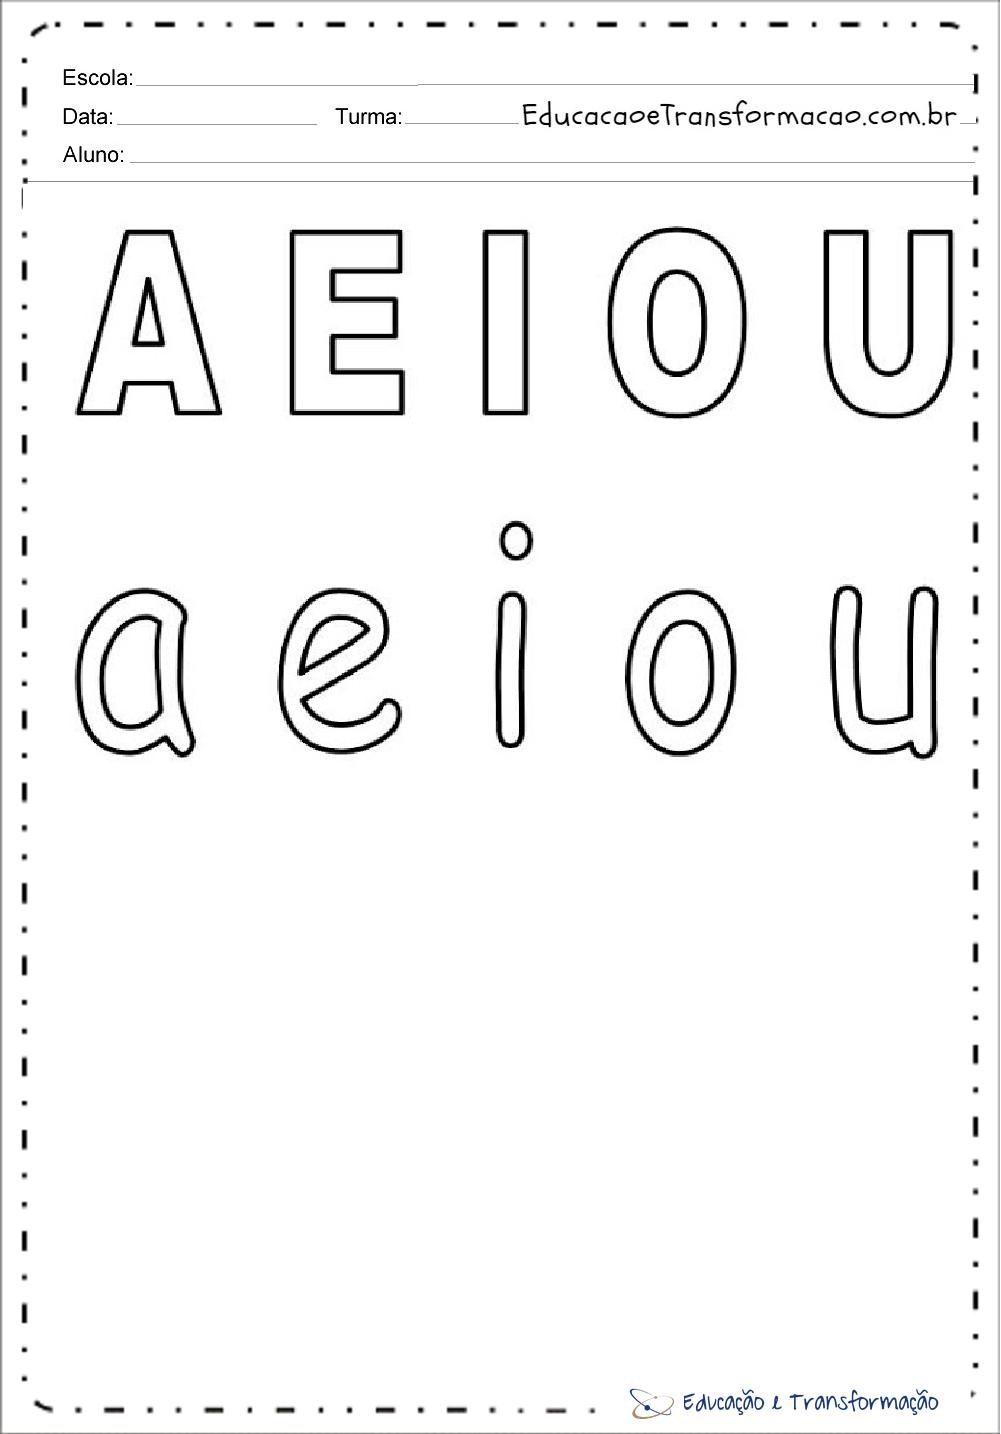 Vogais com letras maiúsculas e minusculas: